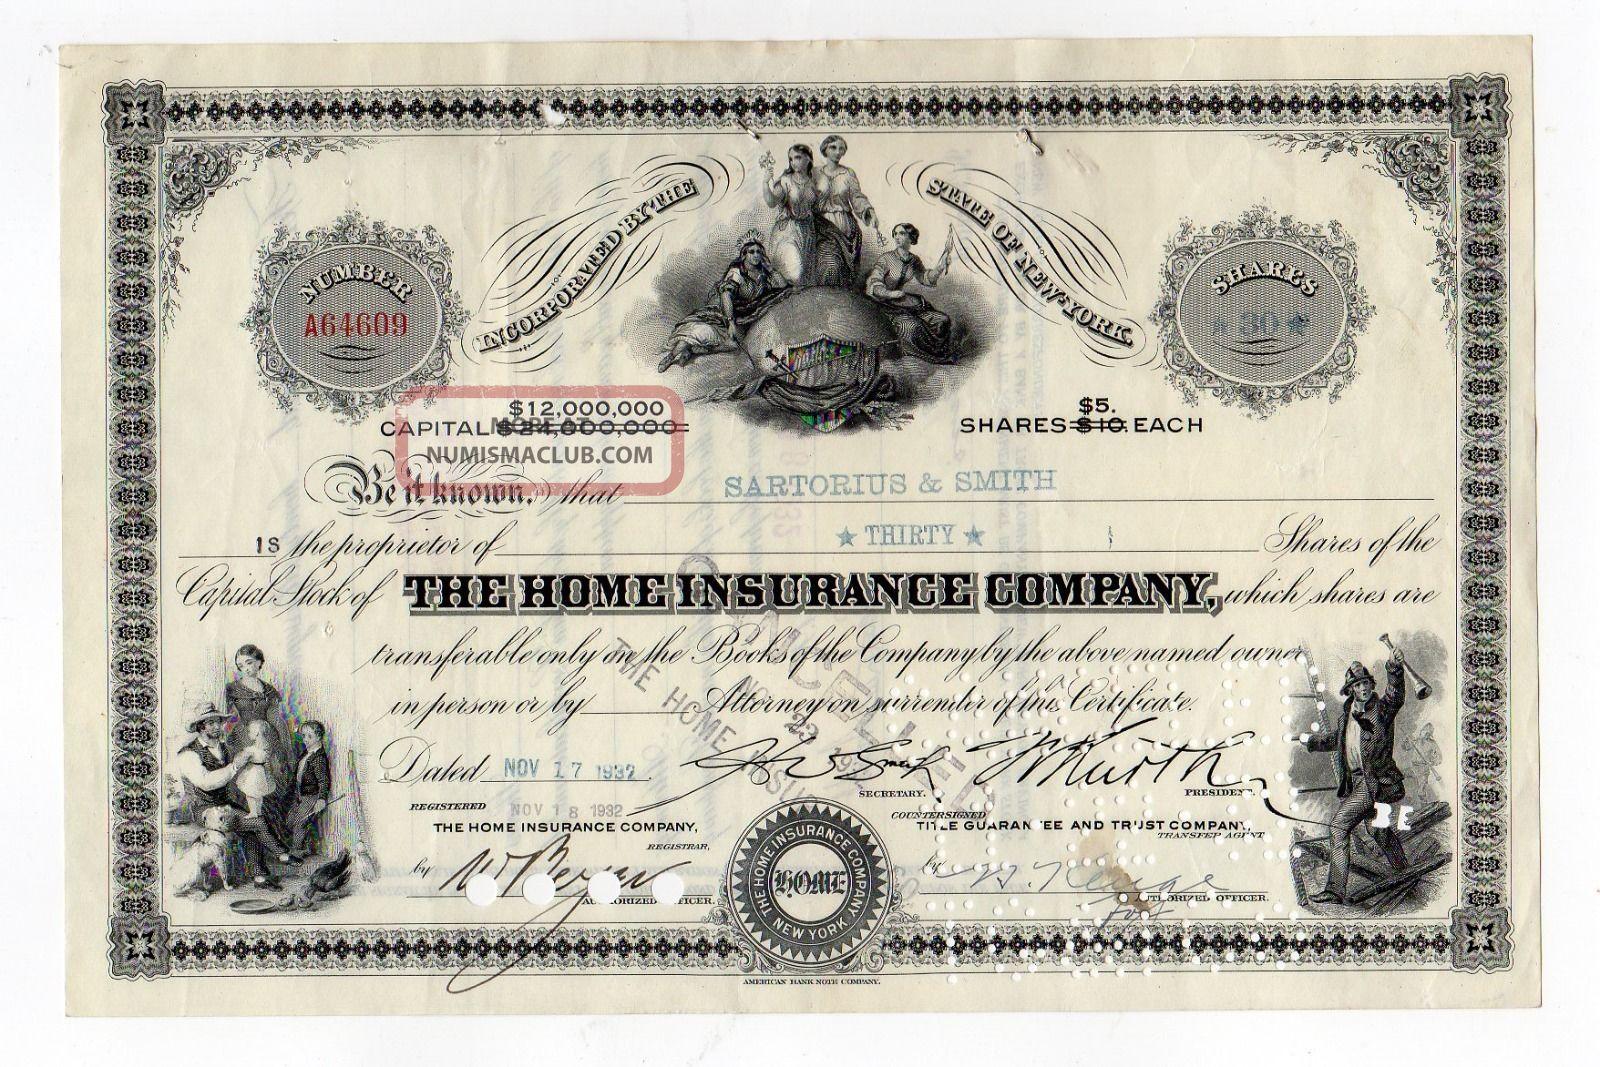 Home Insurance Company Stock Cert. Stocks & Bonds, Scripophily photo